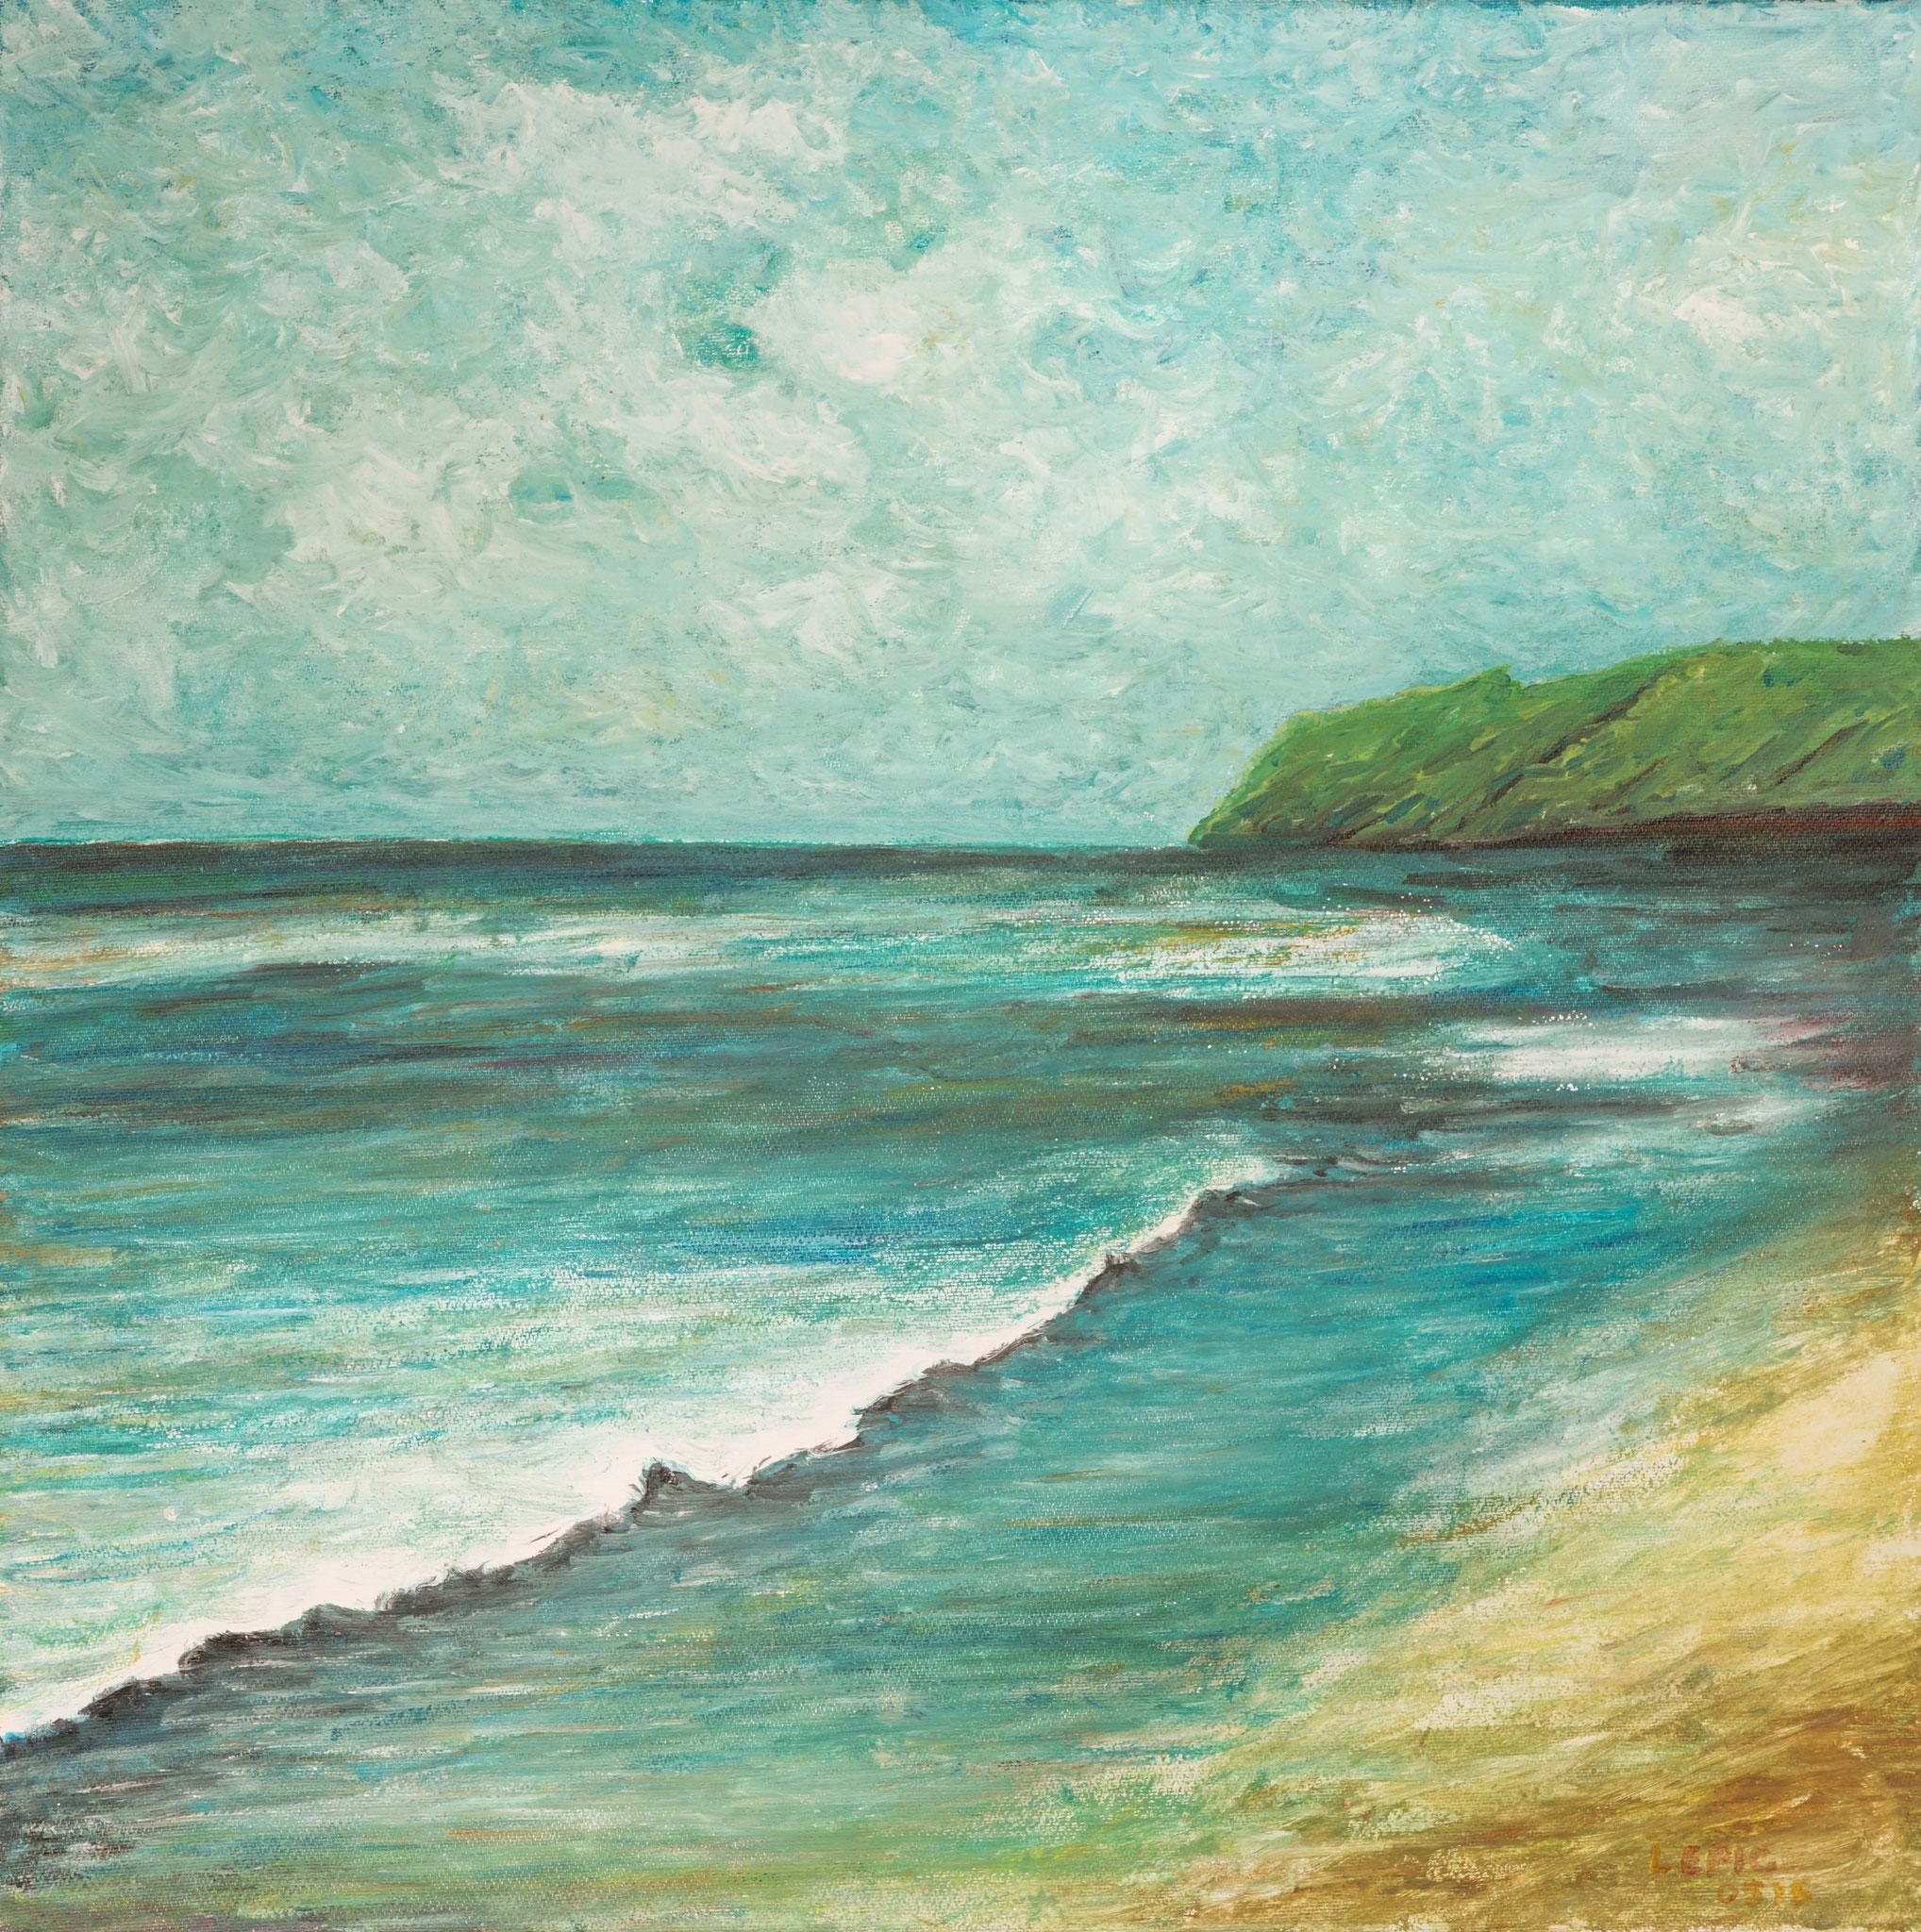 OSTSEE BEI VITTE, HIDDENSEE   Acryl auf Leinwand - 40 x 40 cm